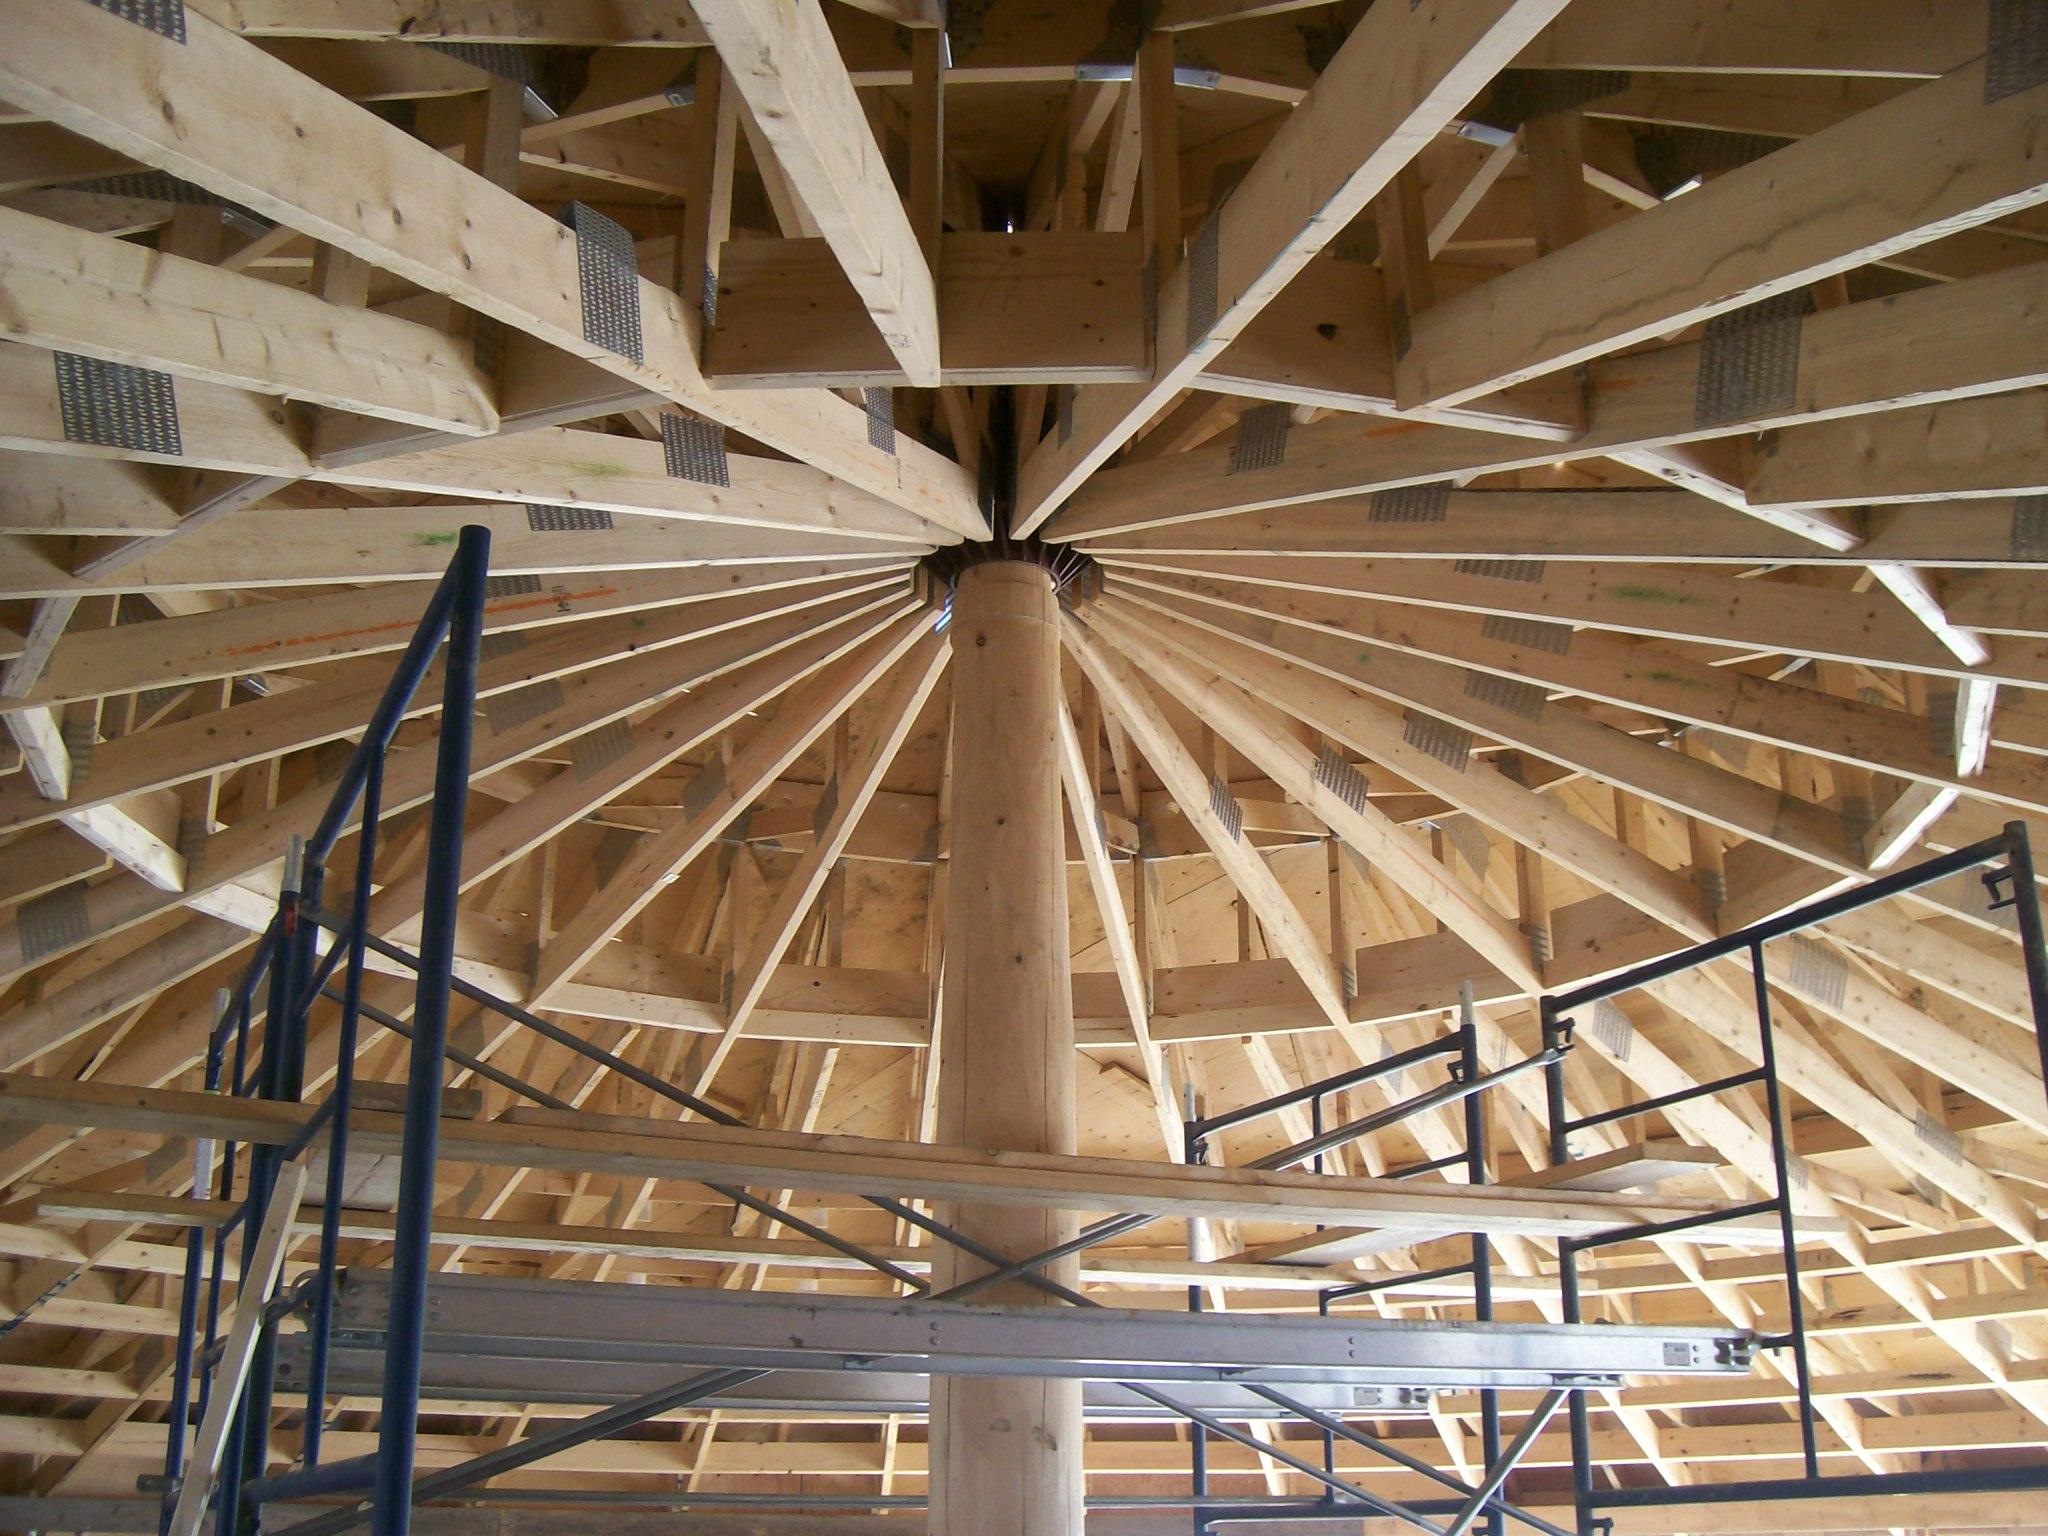 Solar Dragon House - Roof truss framing